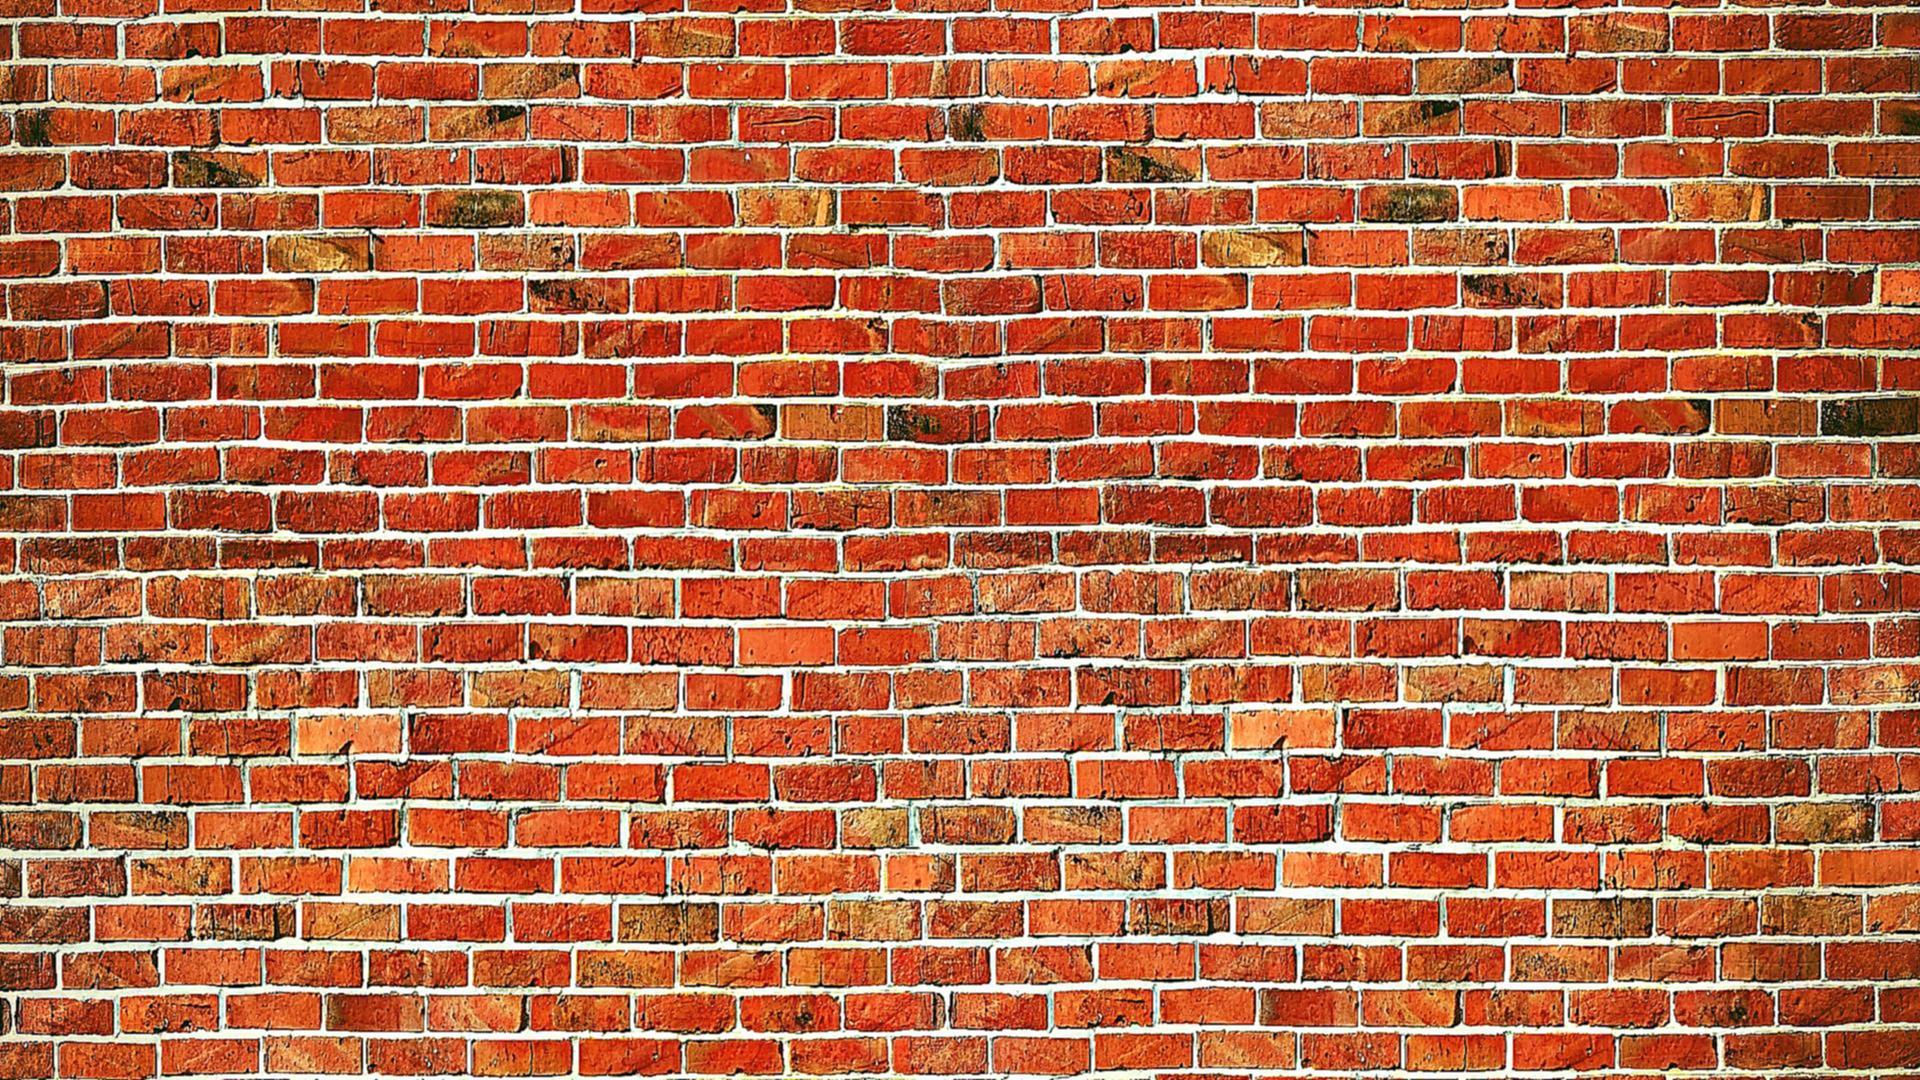 Bricks Wallpapers Top Free Bricks Backgrounds Wallpaperaccess